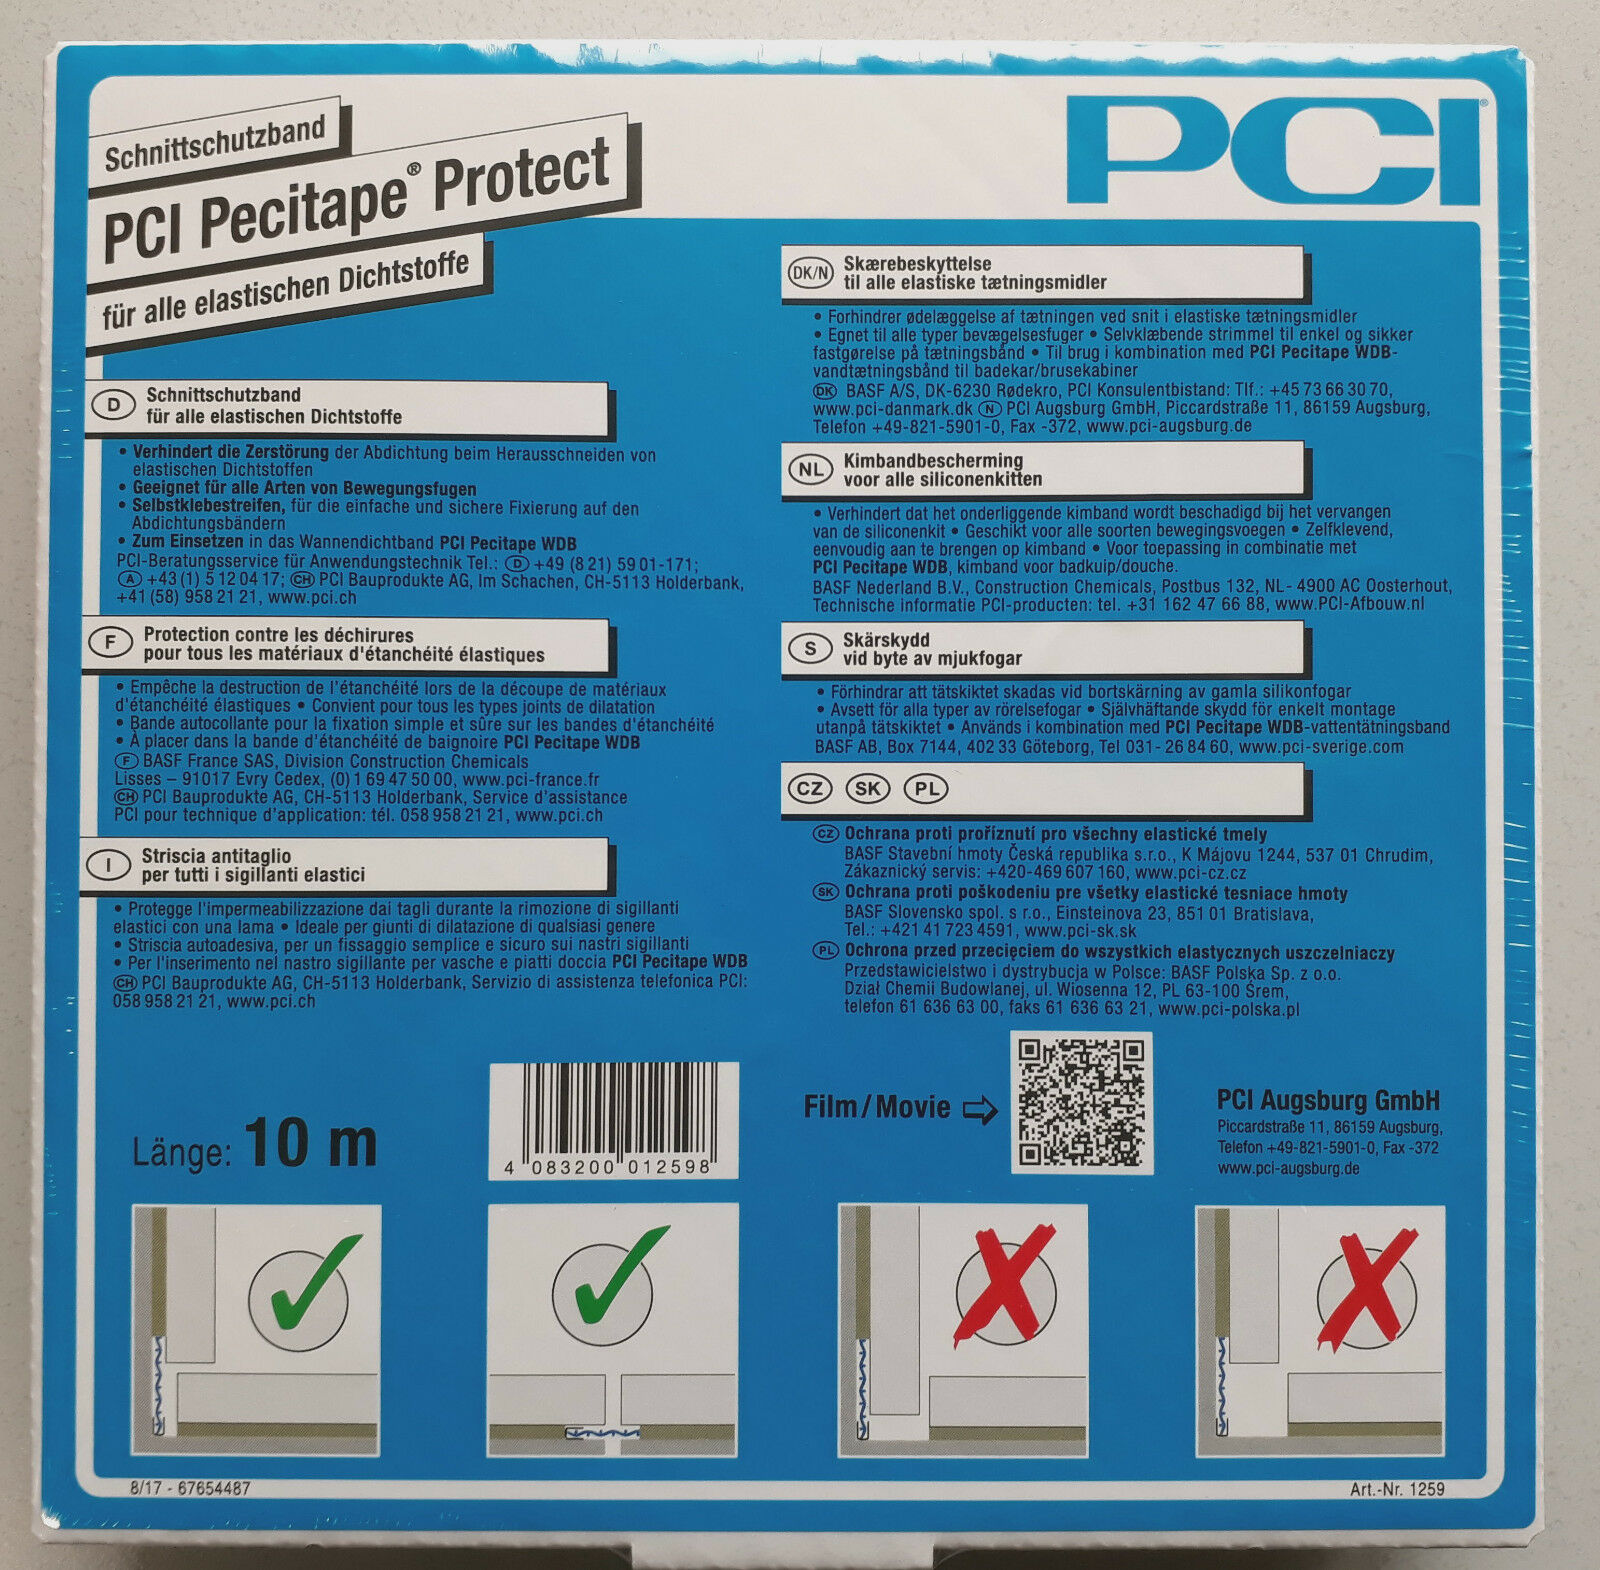 PCI Pecitape Protect 10m Schnittschutzband alle elastischen Dichtstoffe Abroller